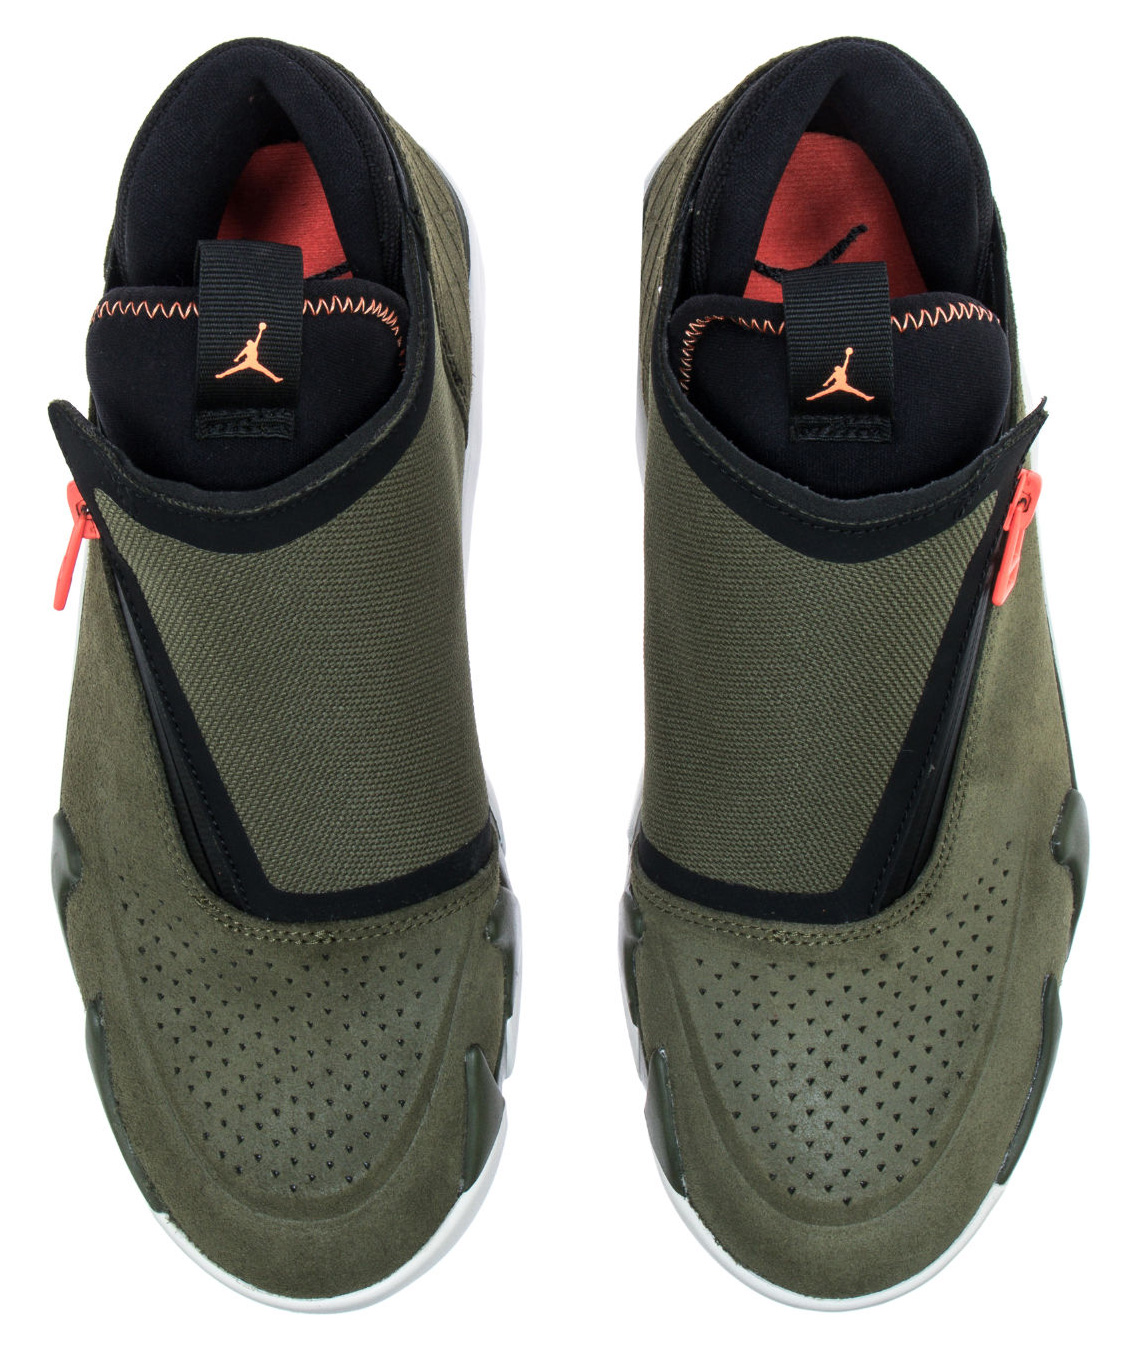 3992faf99c9 Air Jordan Jumpman Z AQ9119-300 Available Now | SneakerNews.com